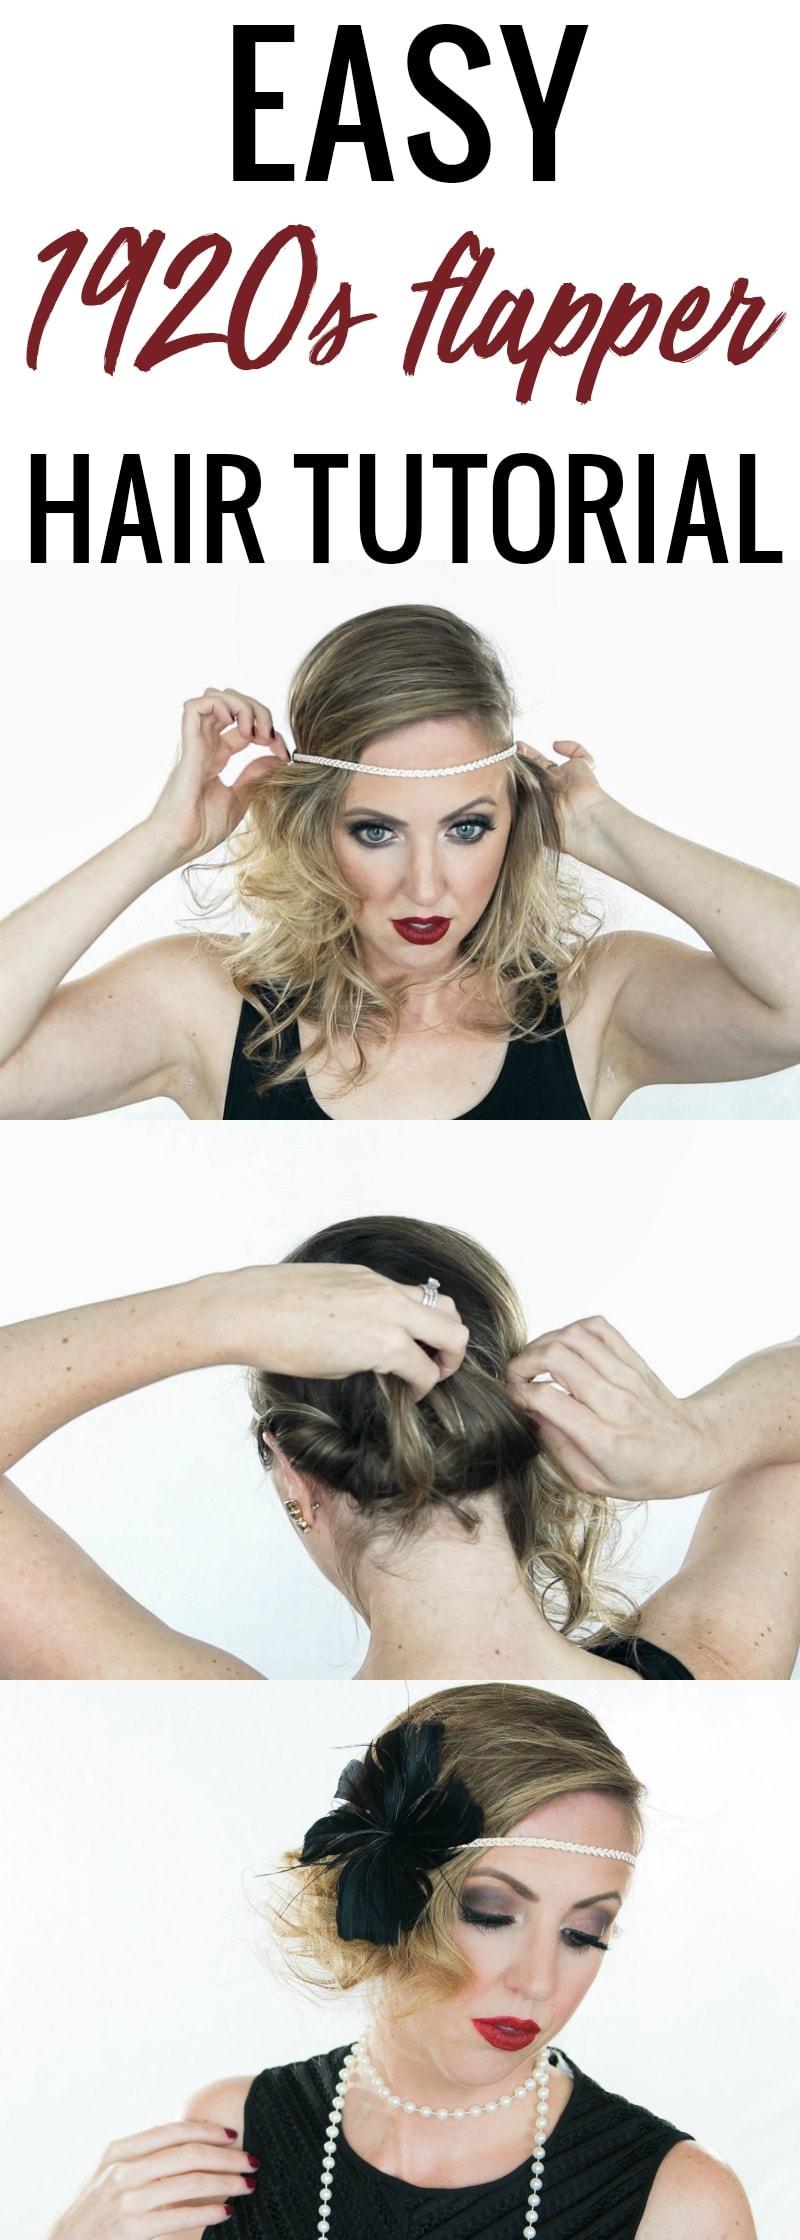 Easy Halloween Hair Tutorial - 1920s Flapper